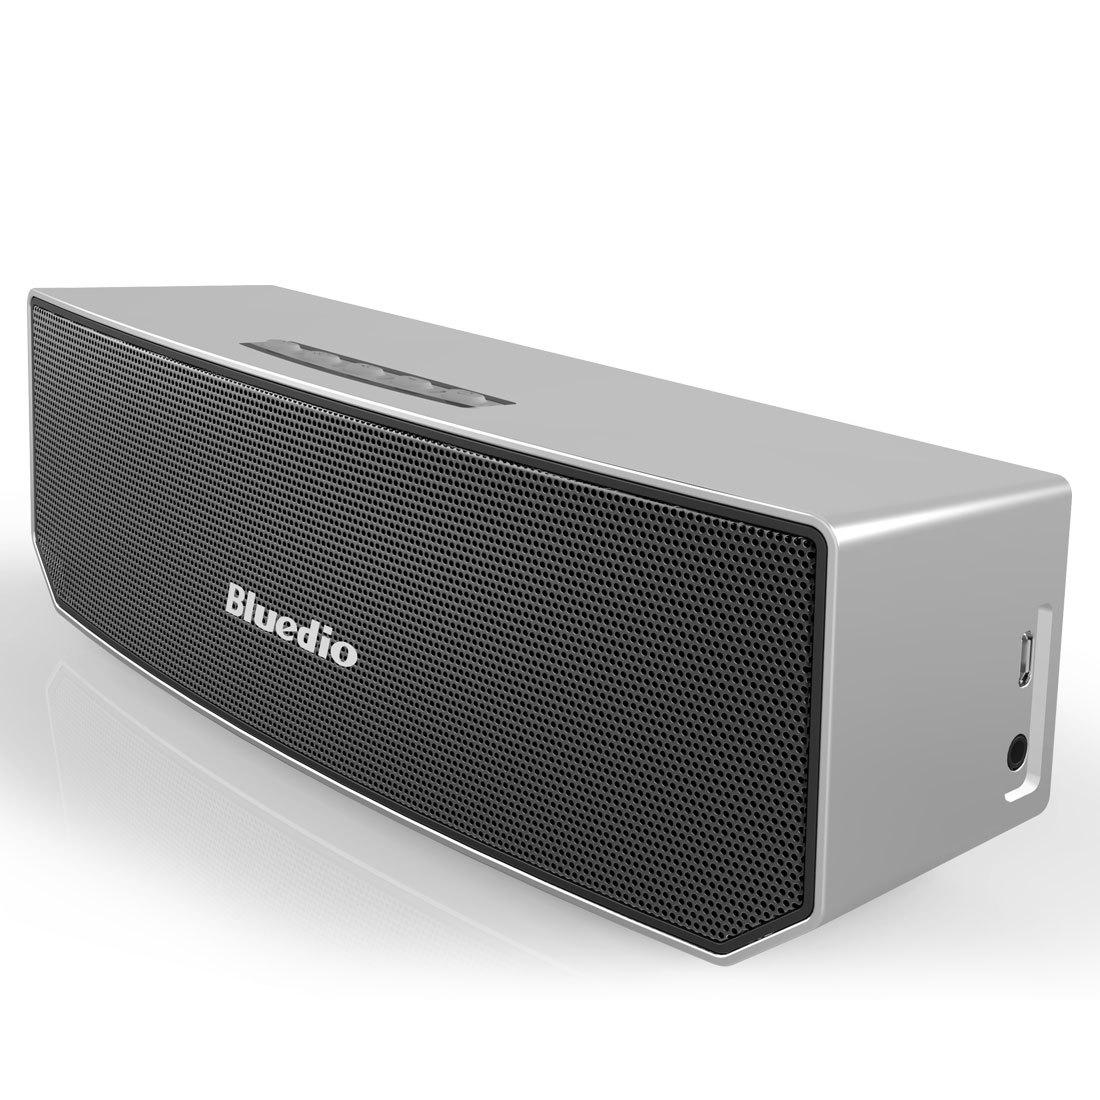 Blau - BS-3 tragbare 3D - bluetooth - lautsprecher stereo - musik macht, mini hi - fi - subwoofer